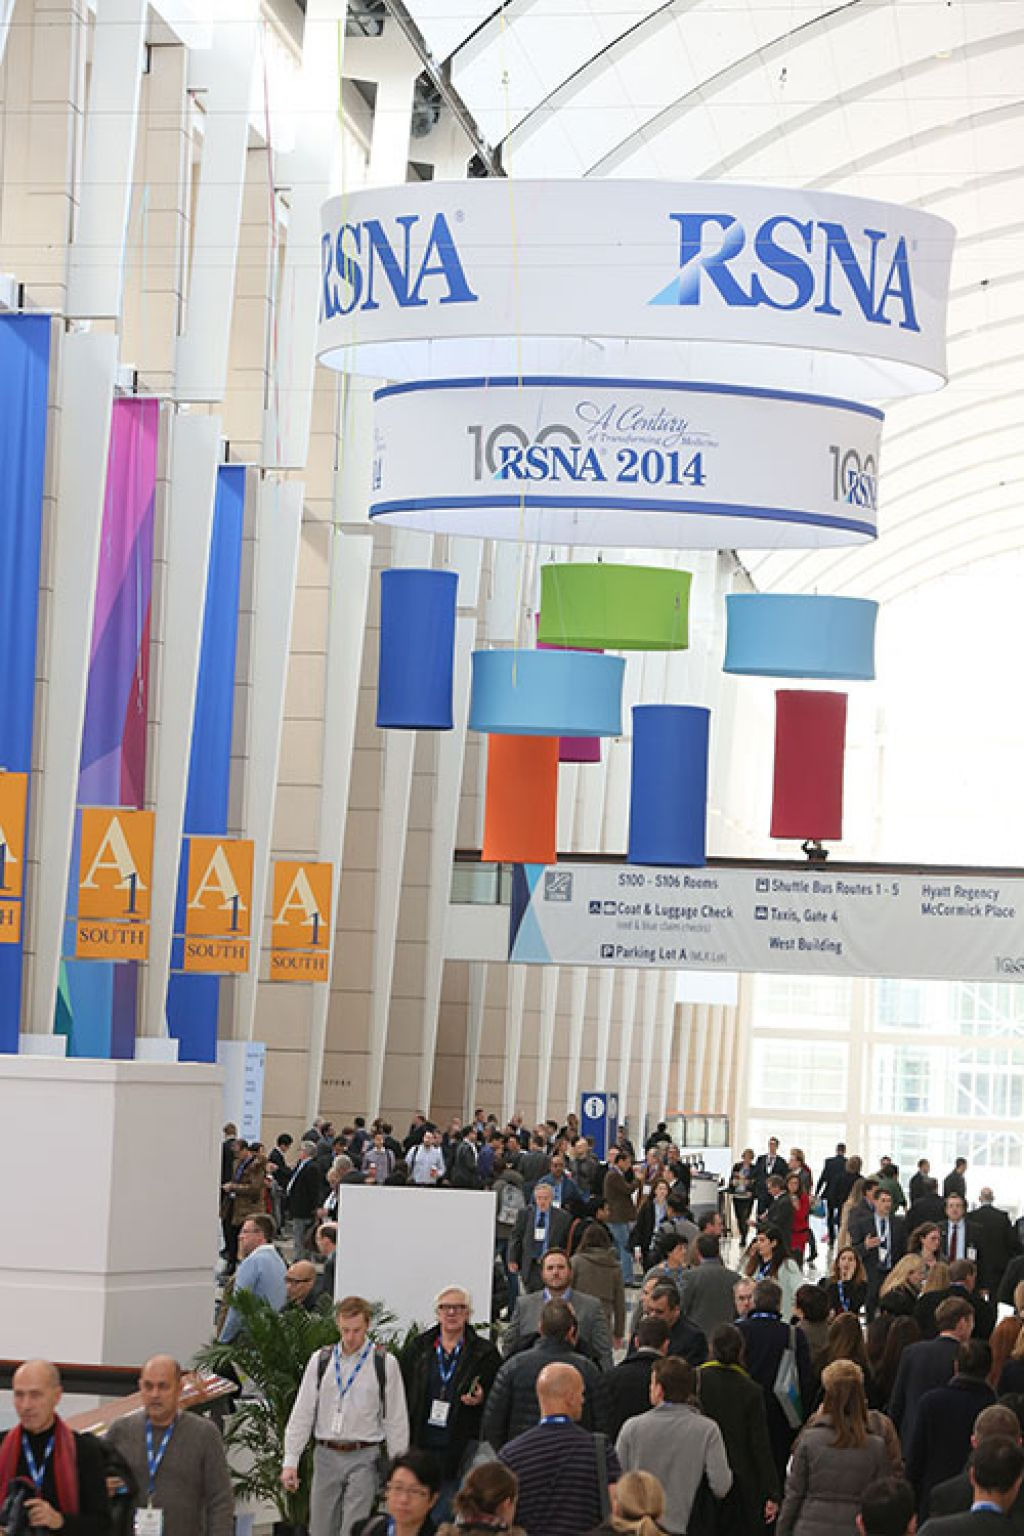 Rsna Exhibition In Chicago